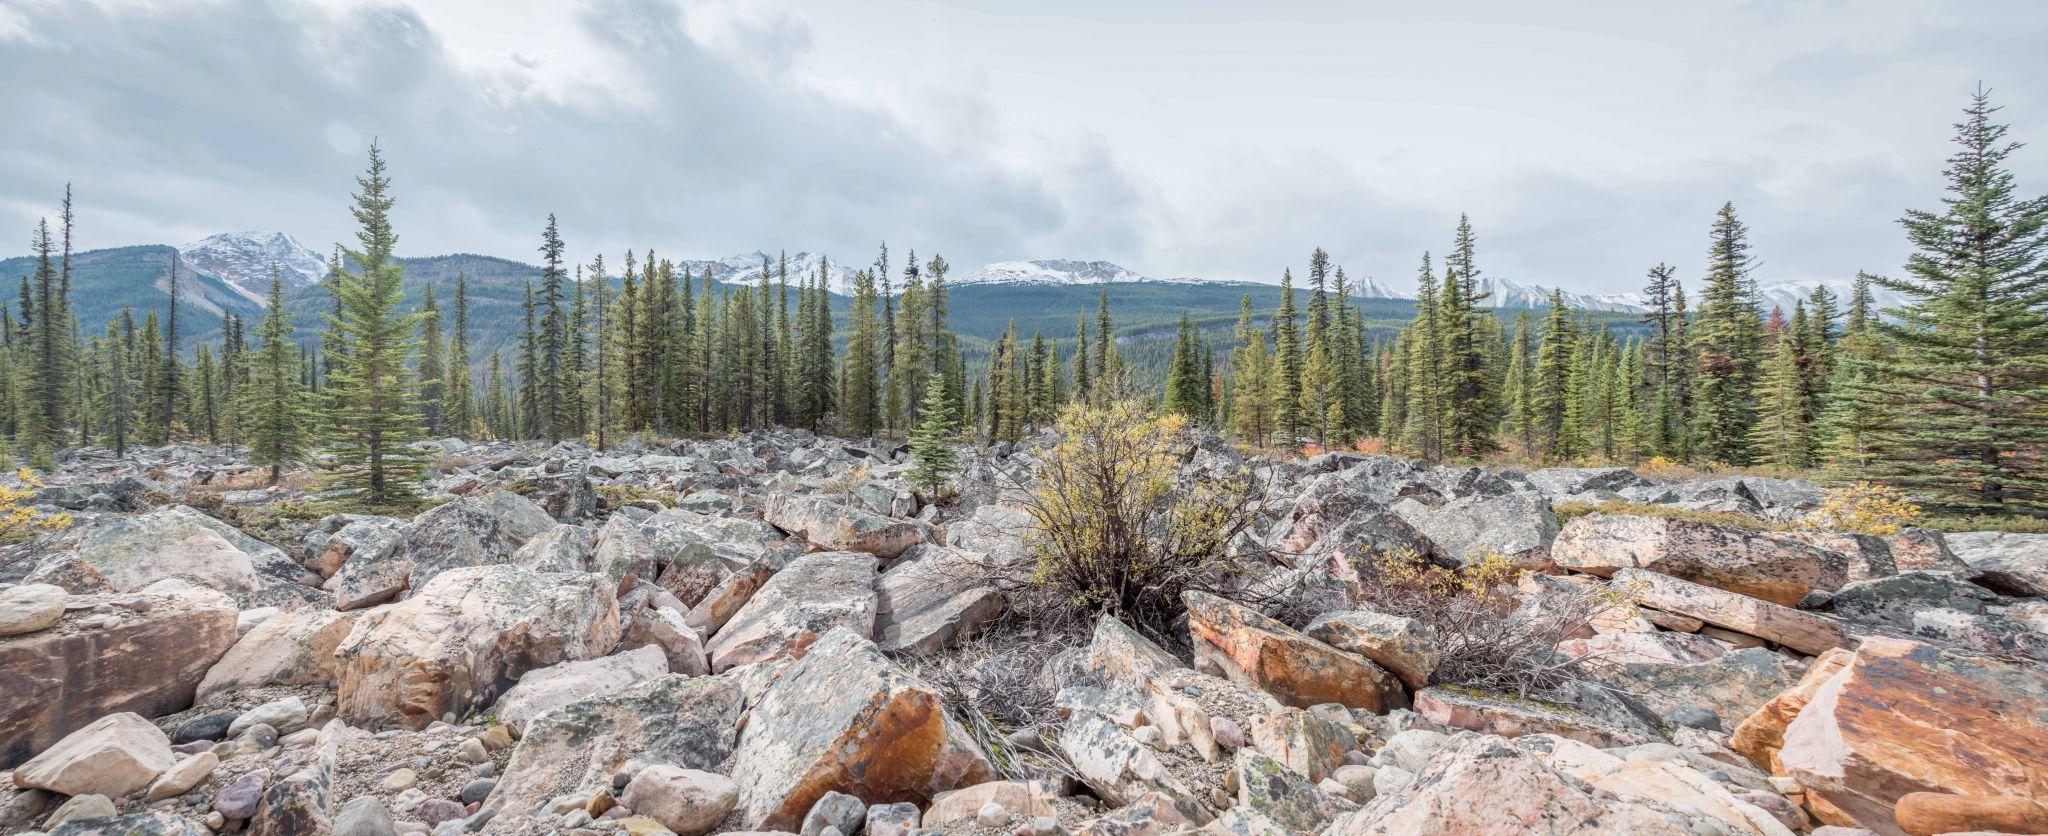 Quartzite Boulder Field - Icefields Parkway, Canada